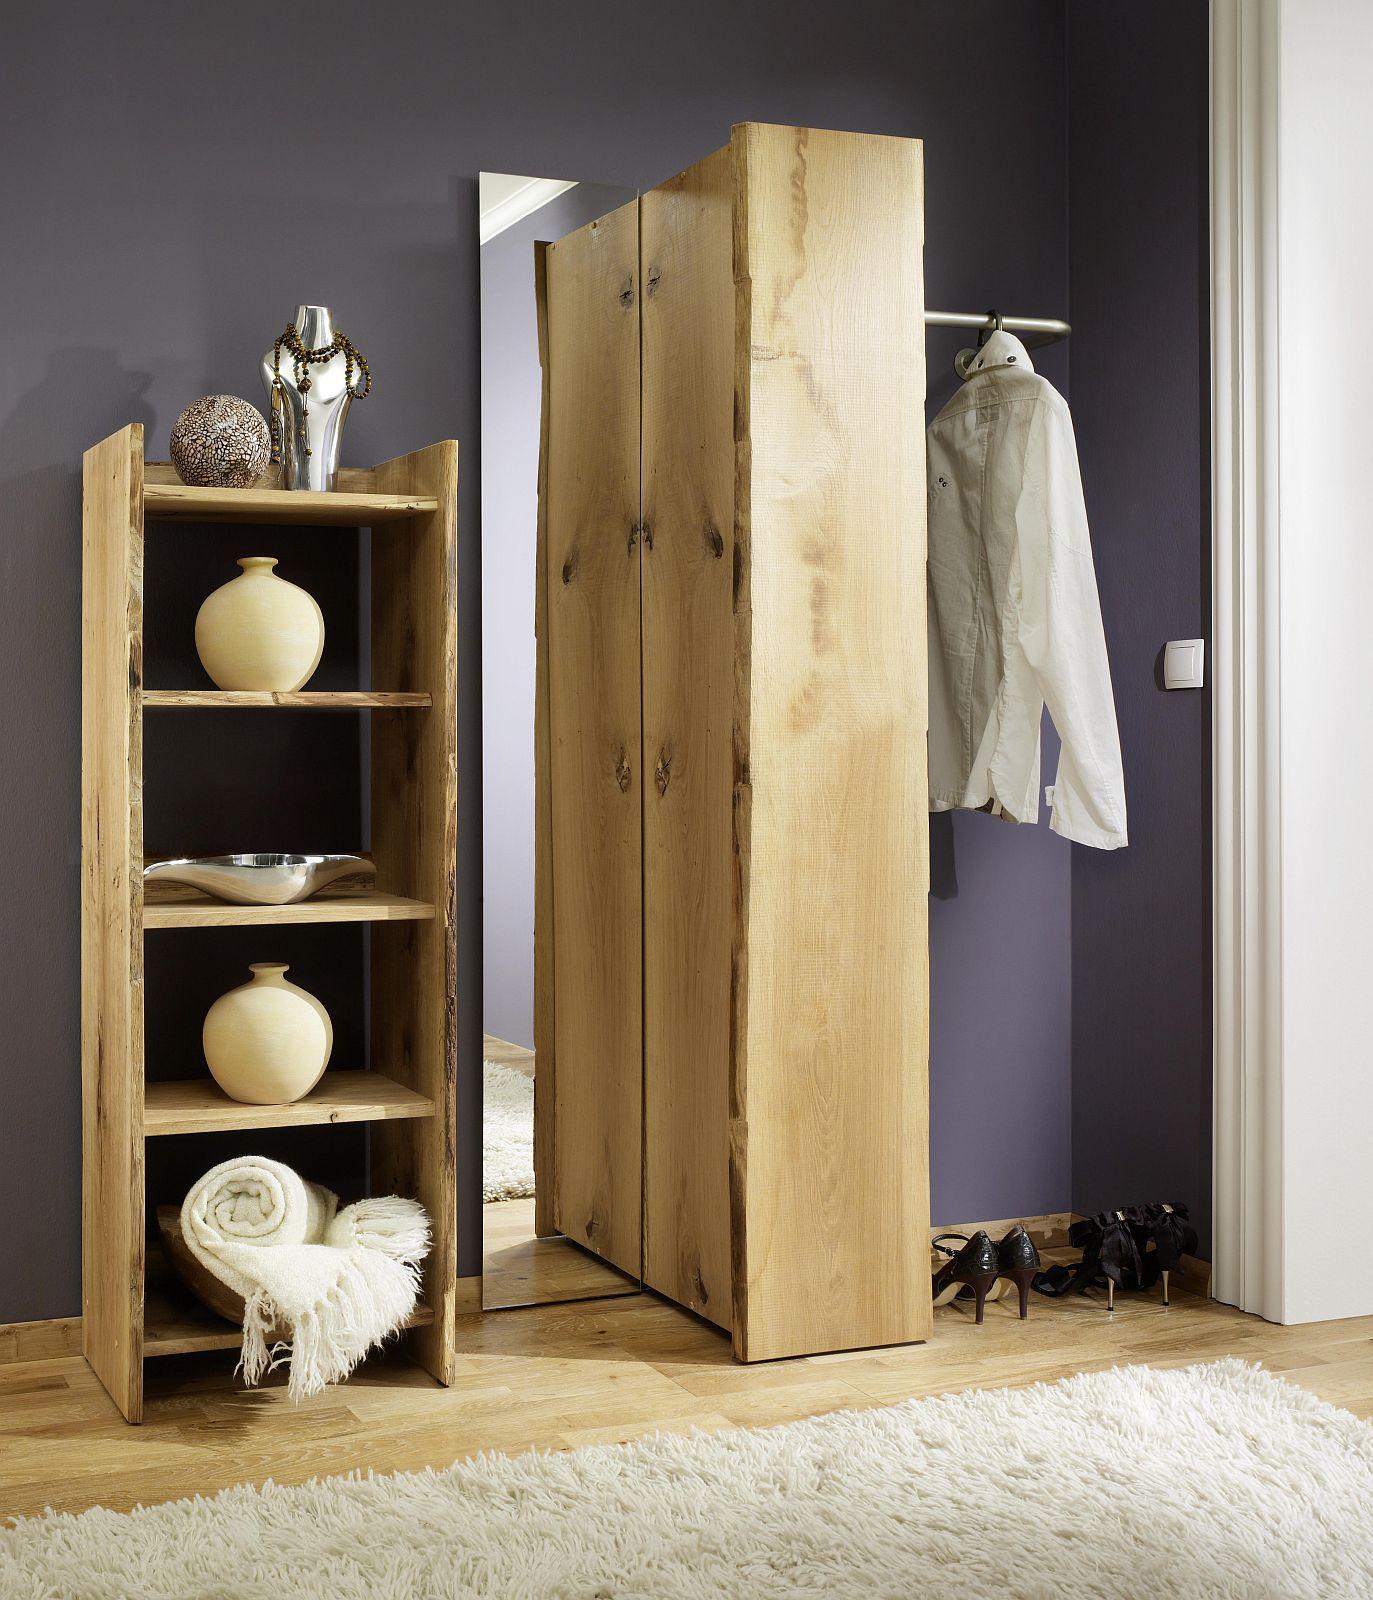 garderobe set 4 teilig landhausstil eiche massiv s gerauh. Black Bedroom Furniture Sets. Home Design Ideas